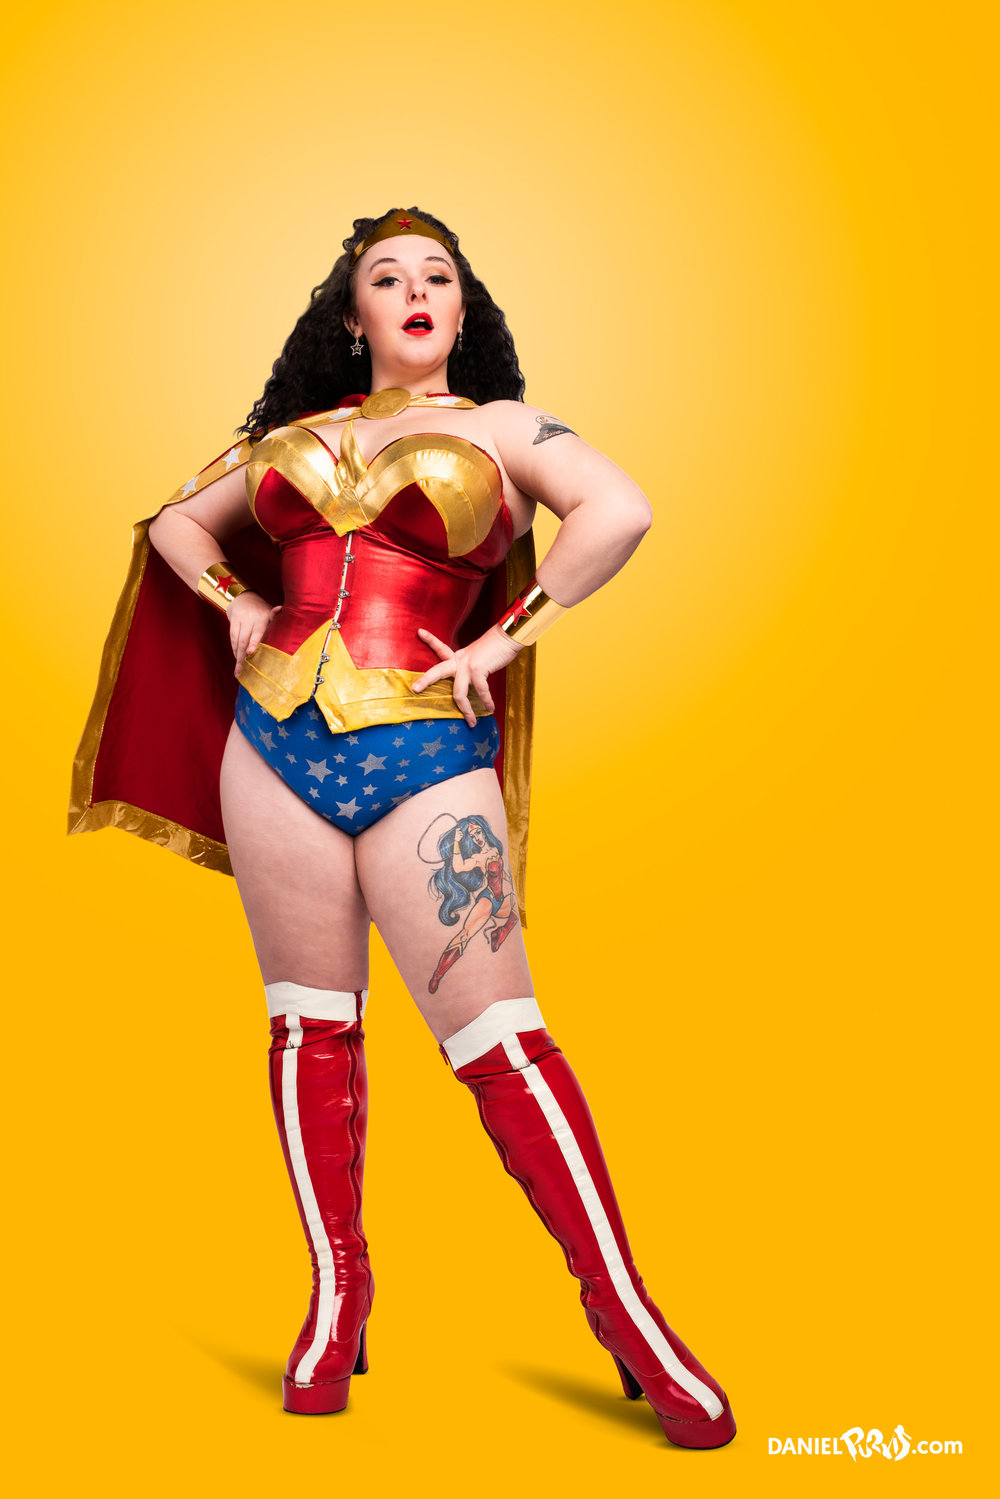 2018 Wonder Woman_DSC6610 v5 sRGB.jpg